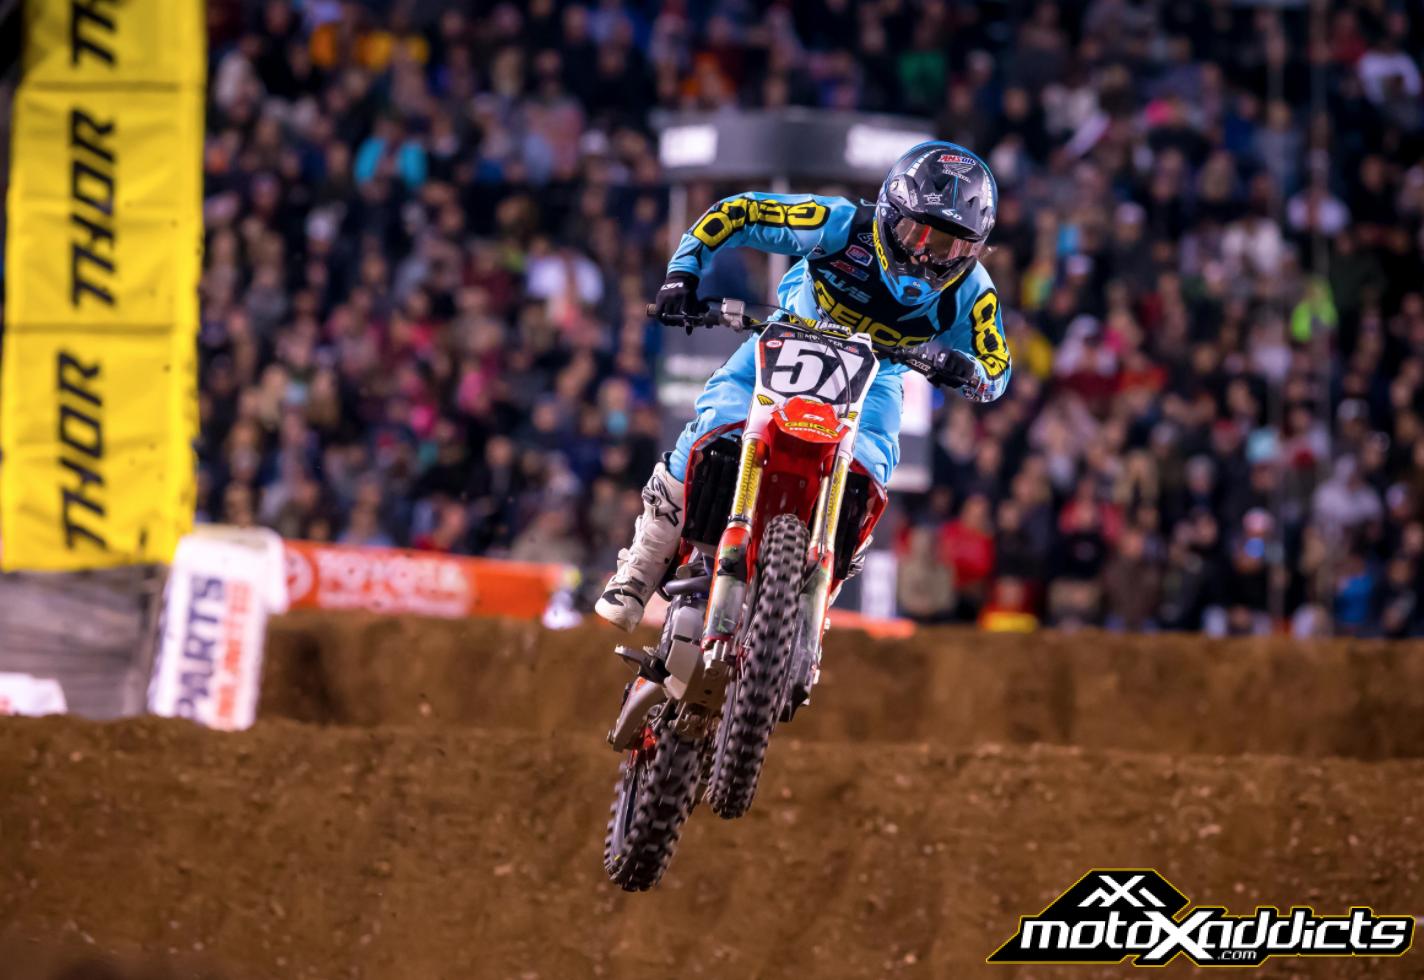 Jimmy Decotis Scores Top 5 at Salt Lake City SX